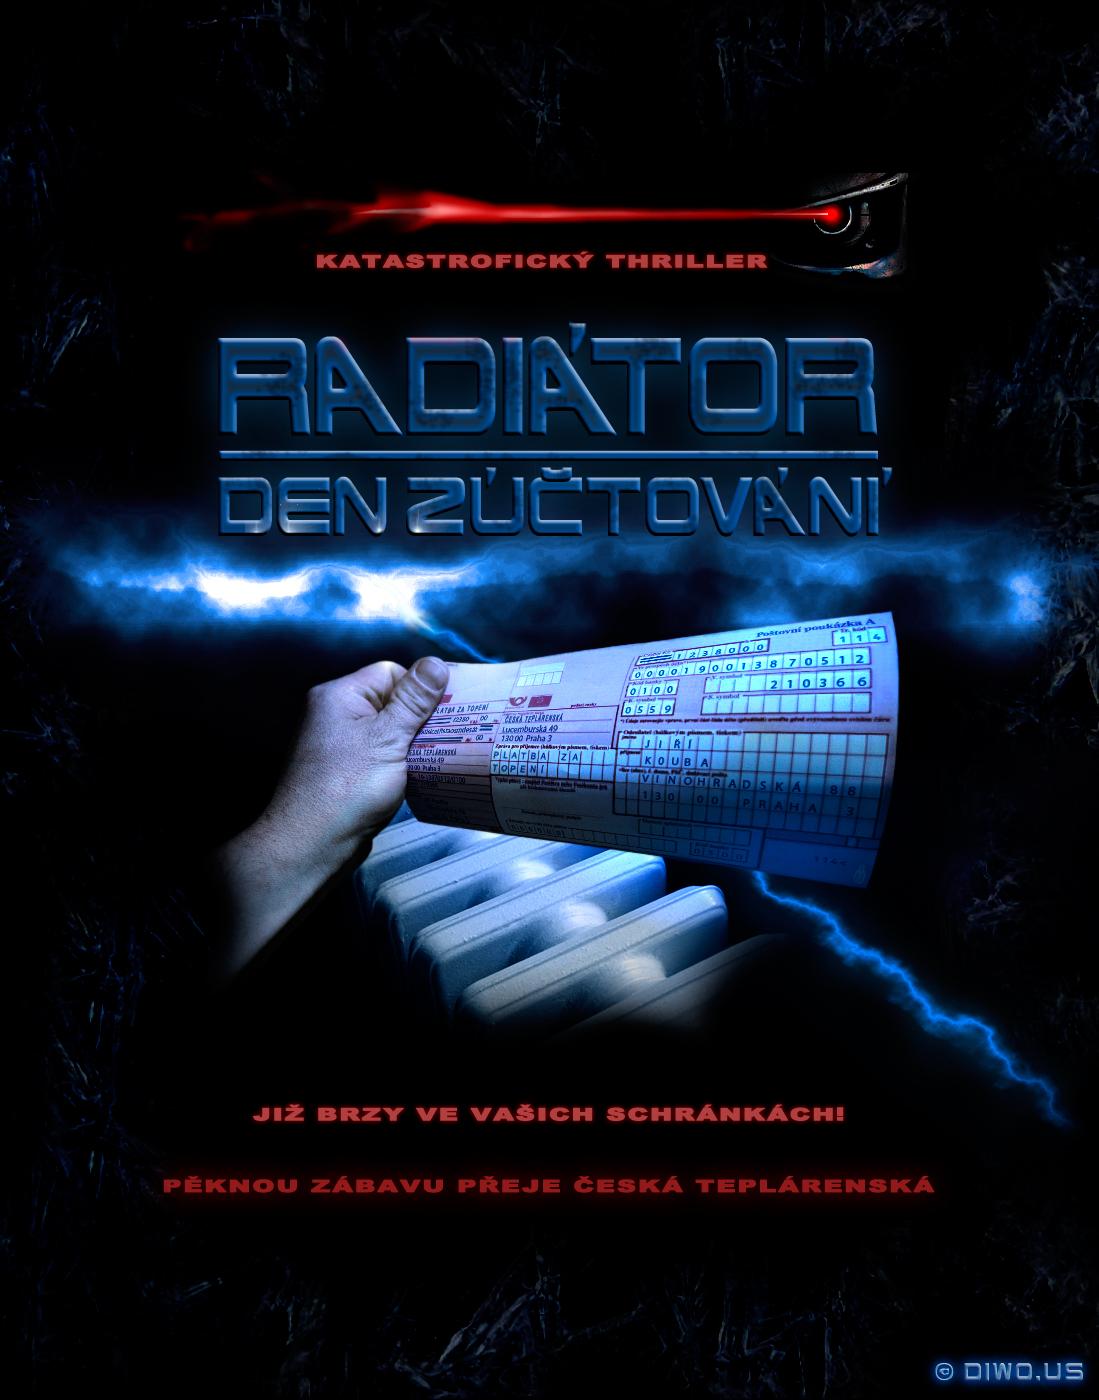 Katastrofický thriller RADIÁTOR